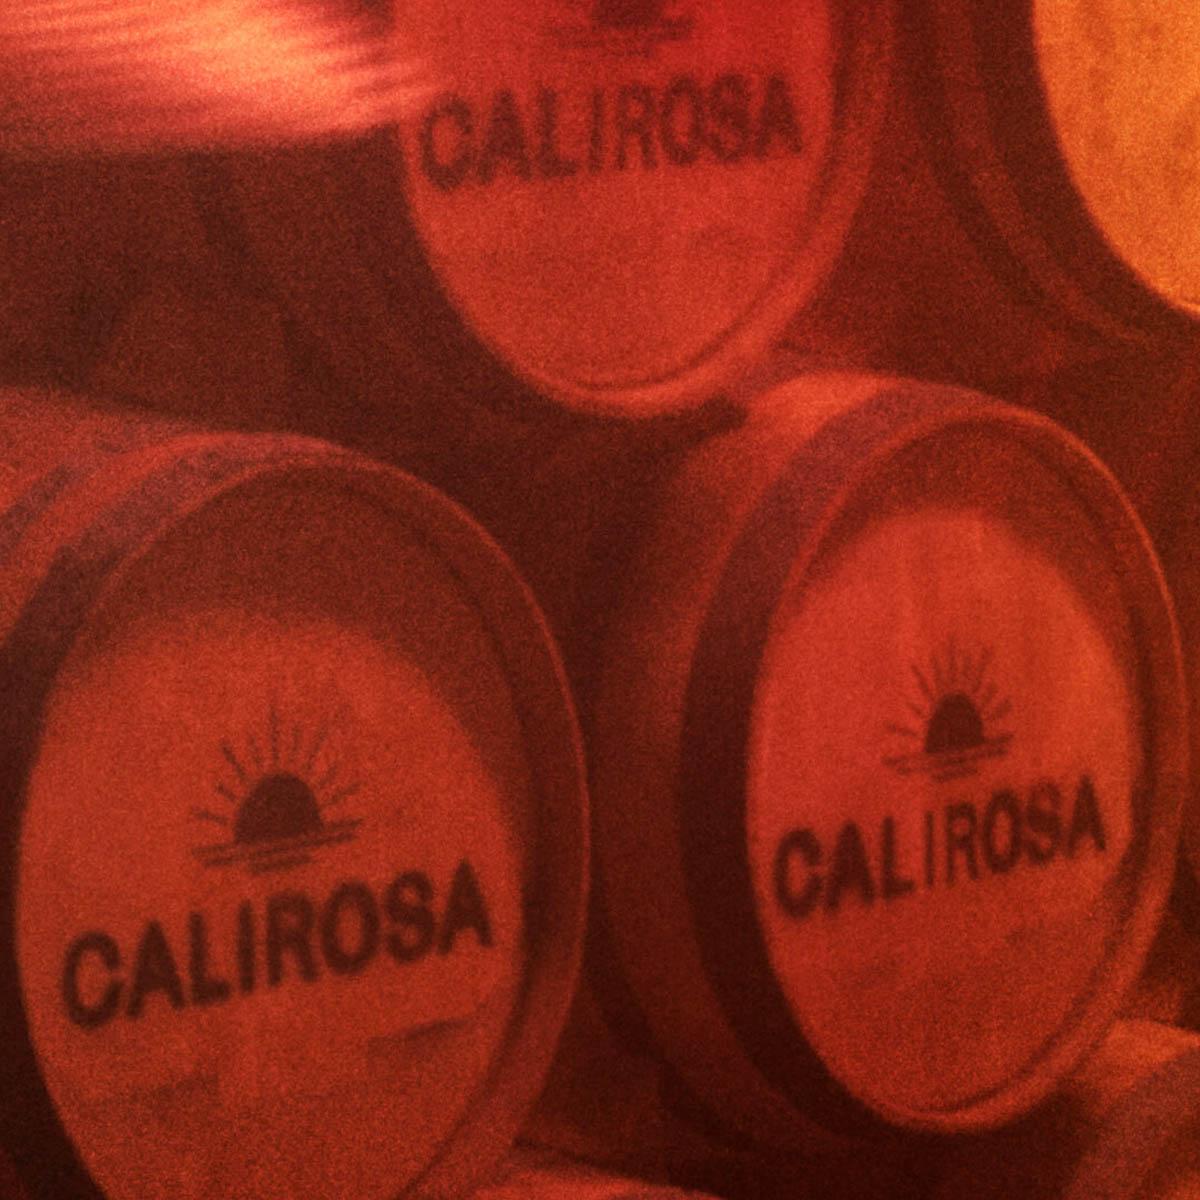 Calirosa red wine aged barrels